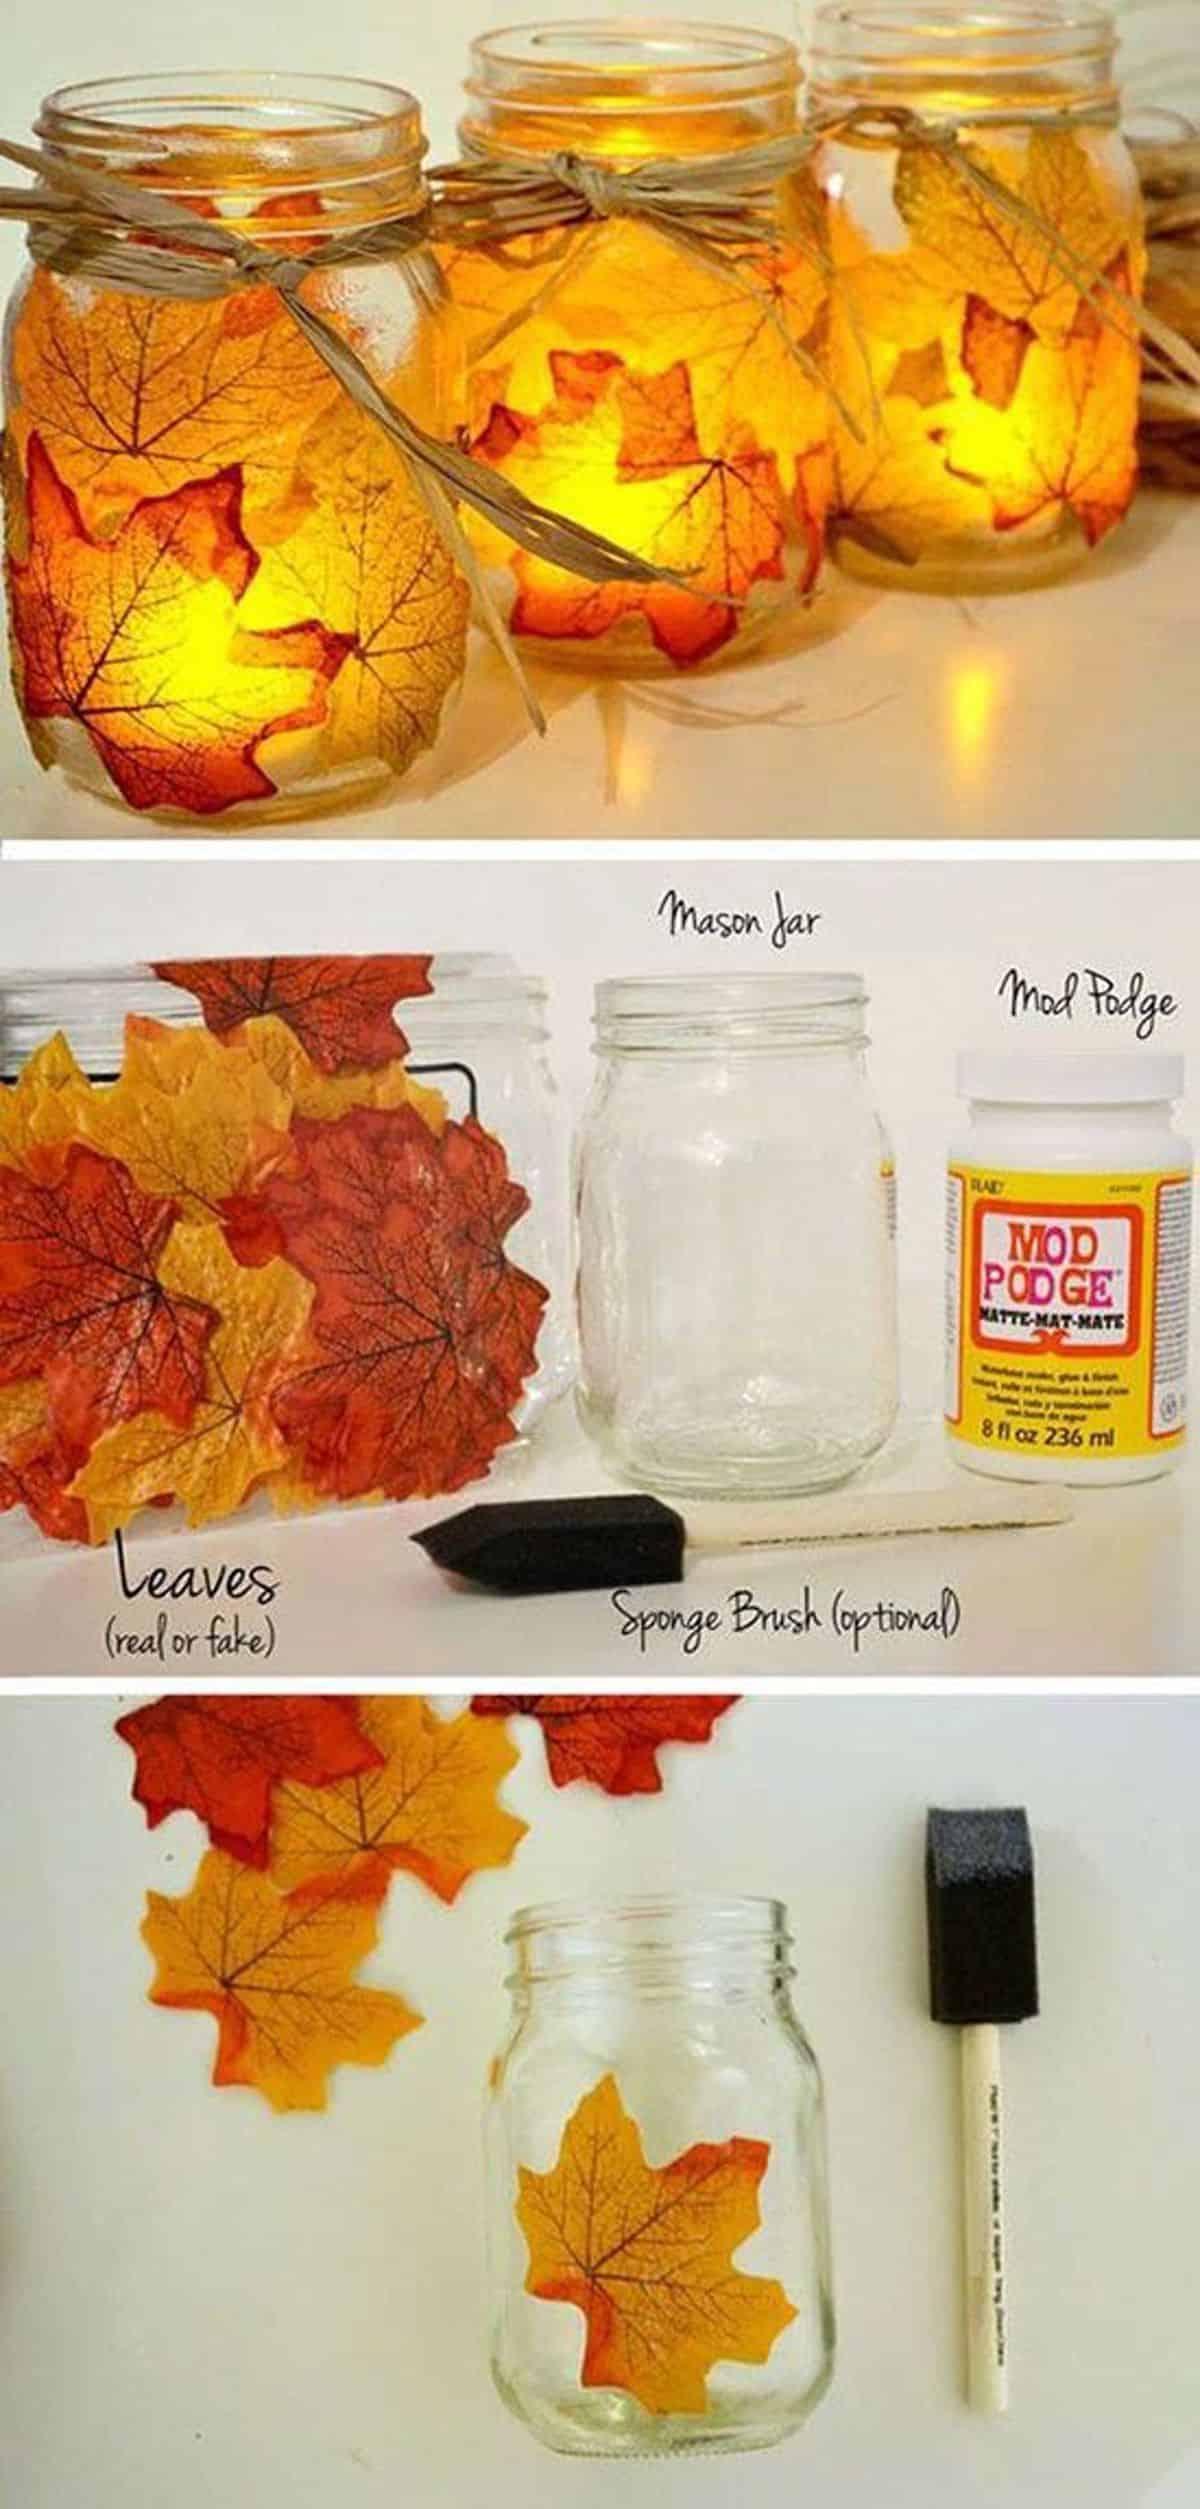 The Autumn Leaf Candle Holder